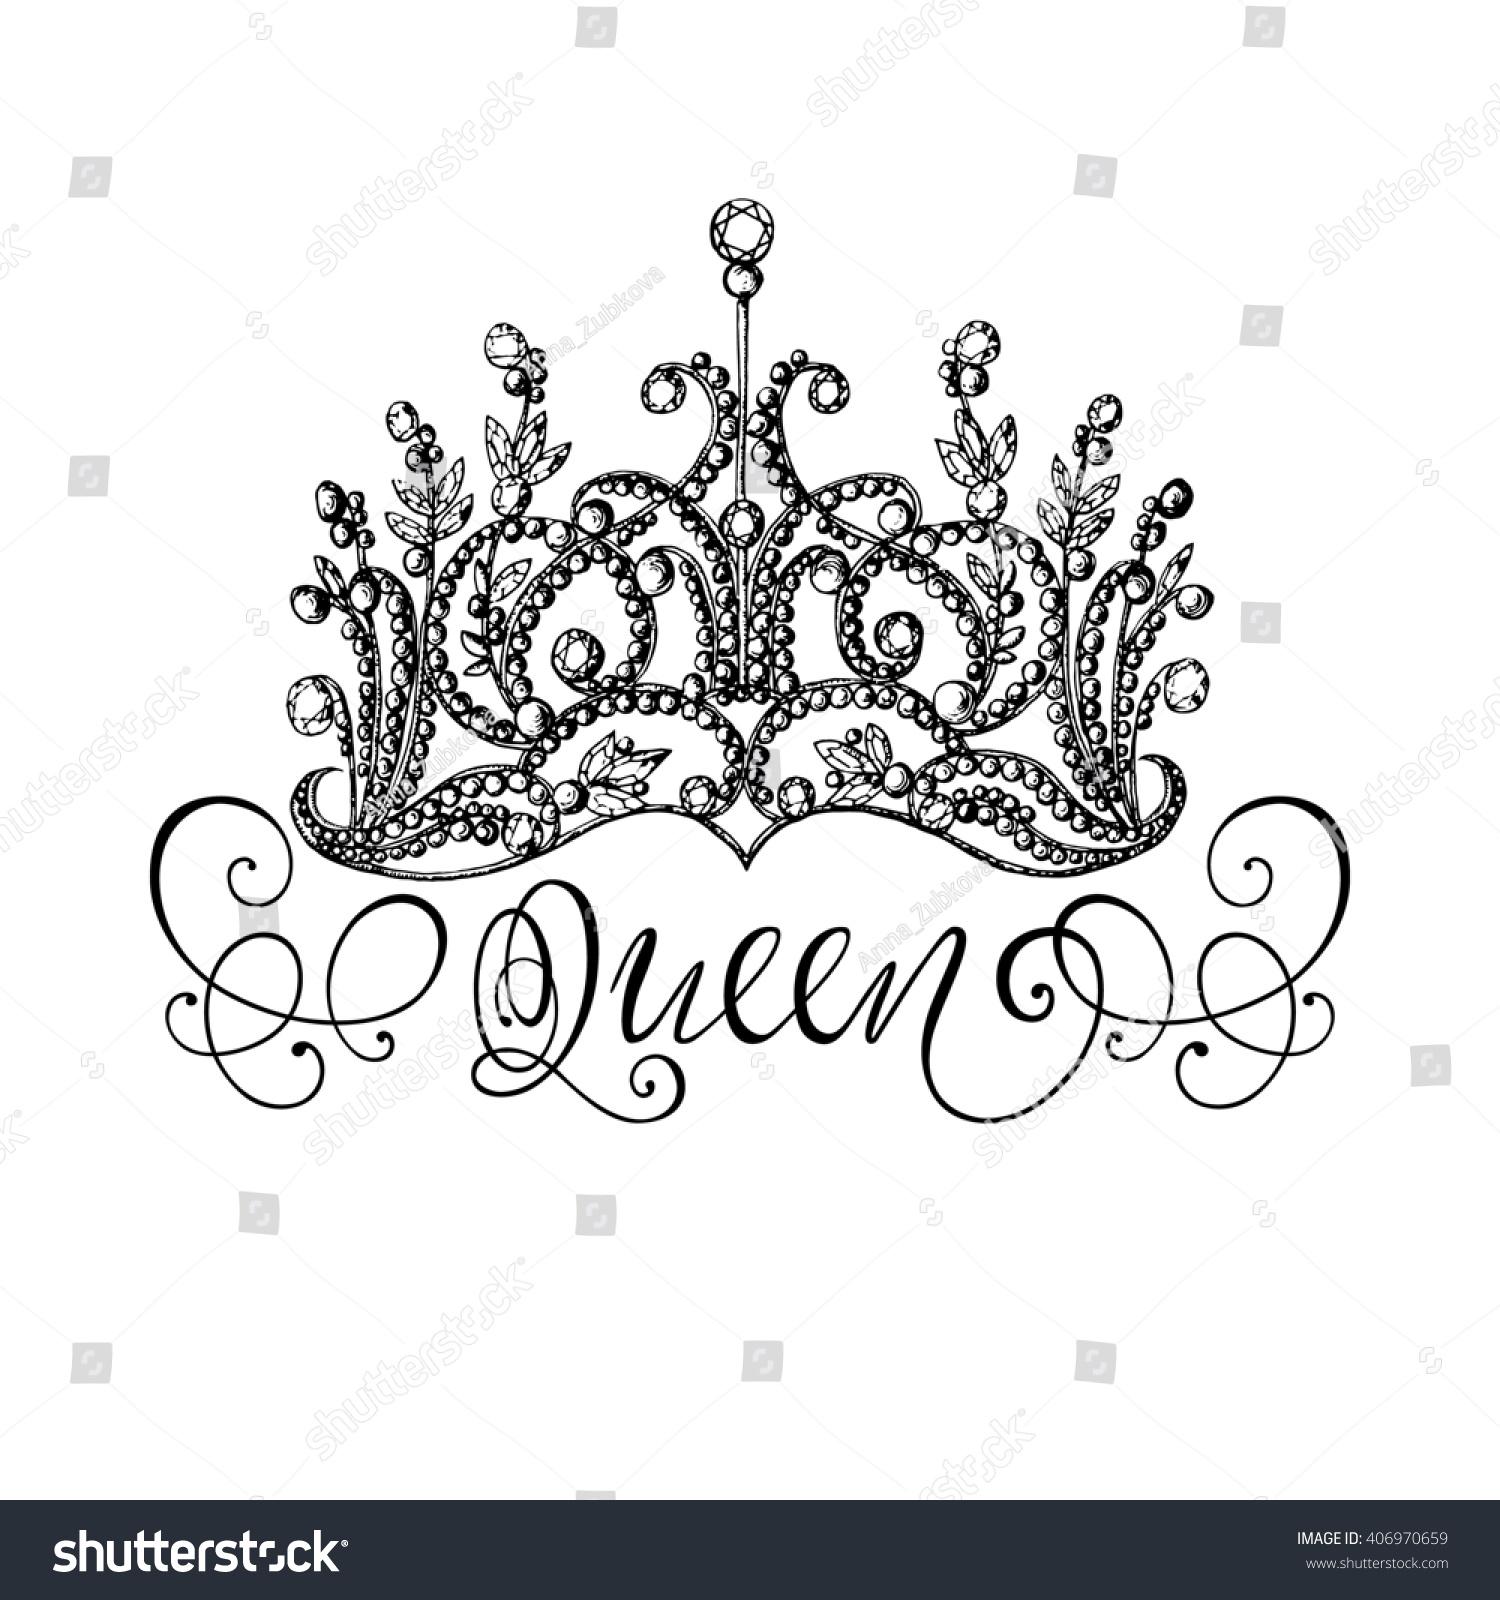 Elegant Handdrawn Queen Crown Lettering Graphic Stock Illustration ...